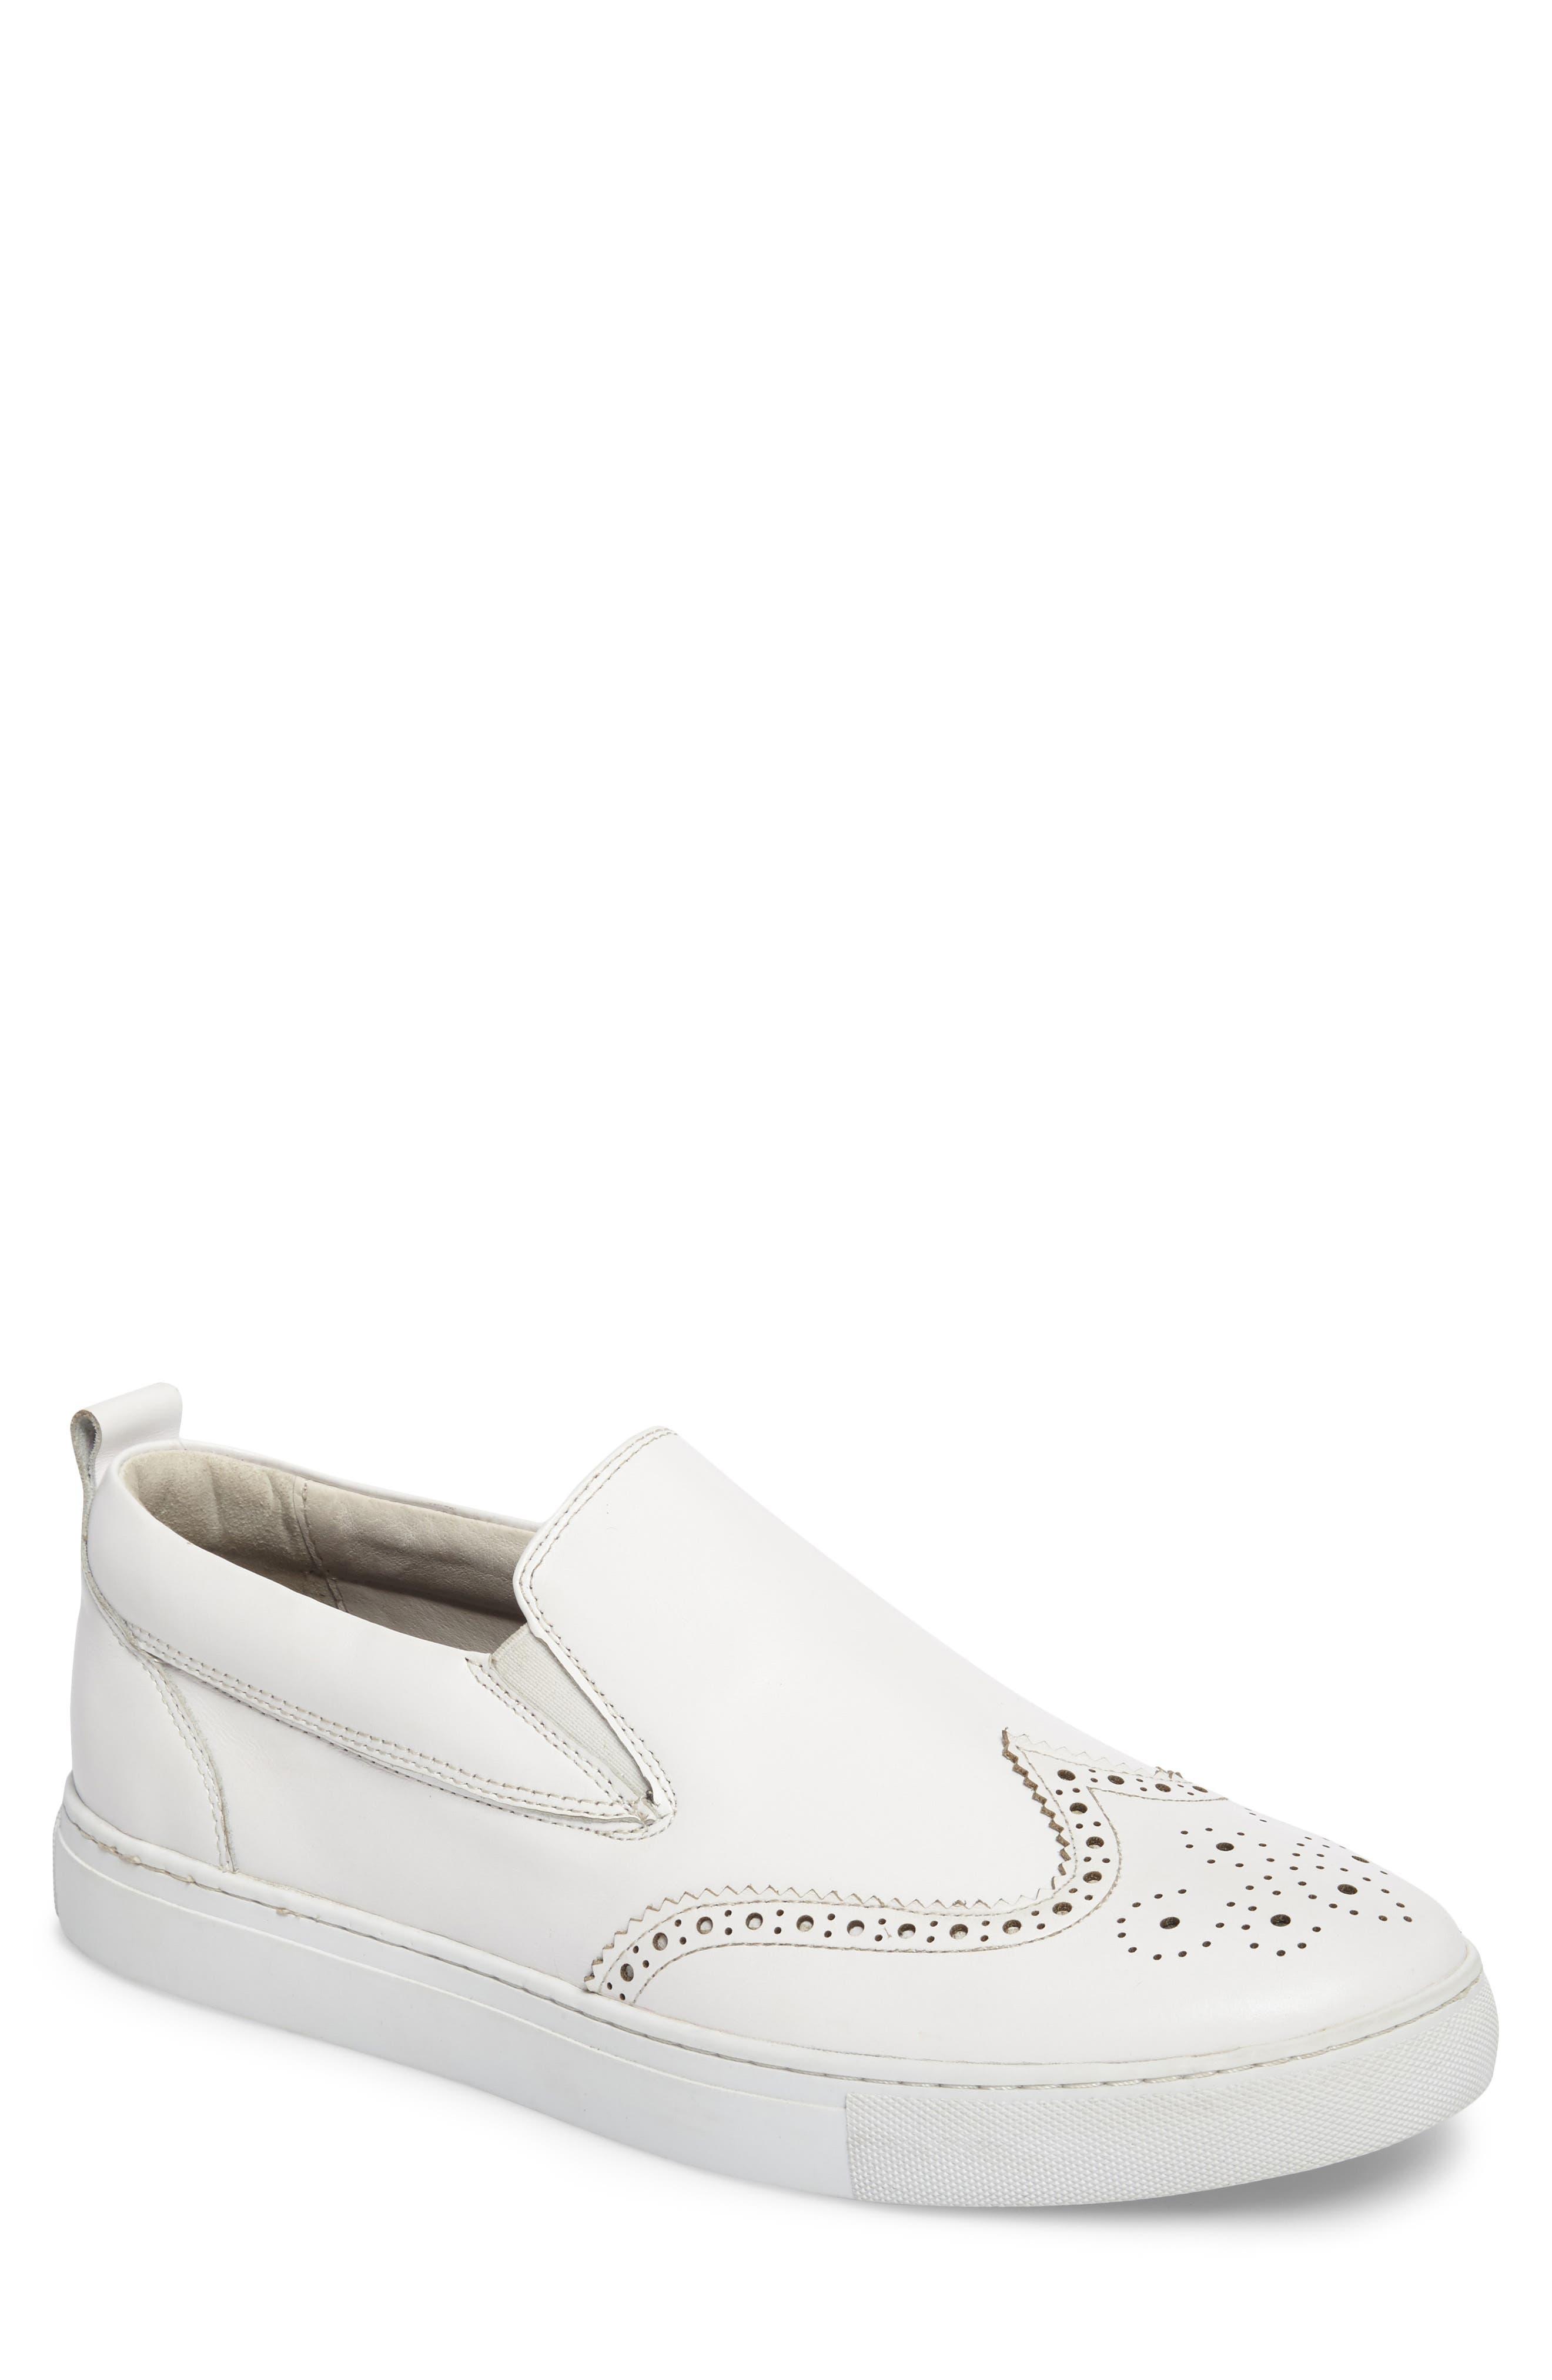 Ali Wingtip Slip-On Sneaker,                             Main thumbnail 1, color,                             White Leather